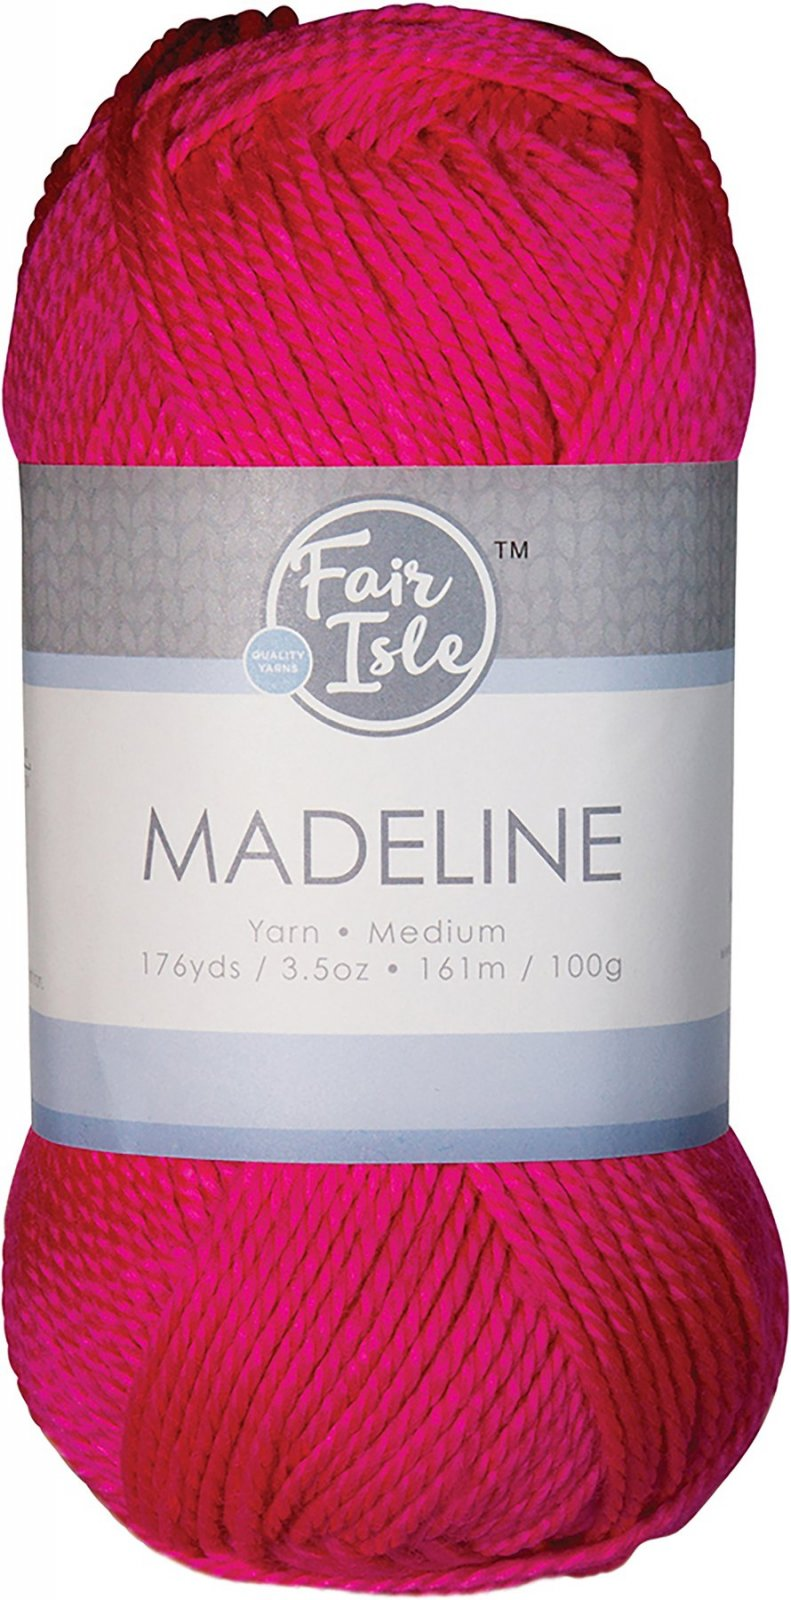 Fair Isle - Madeline - Pink Shock